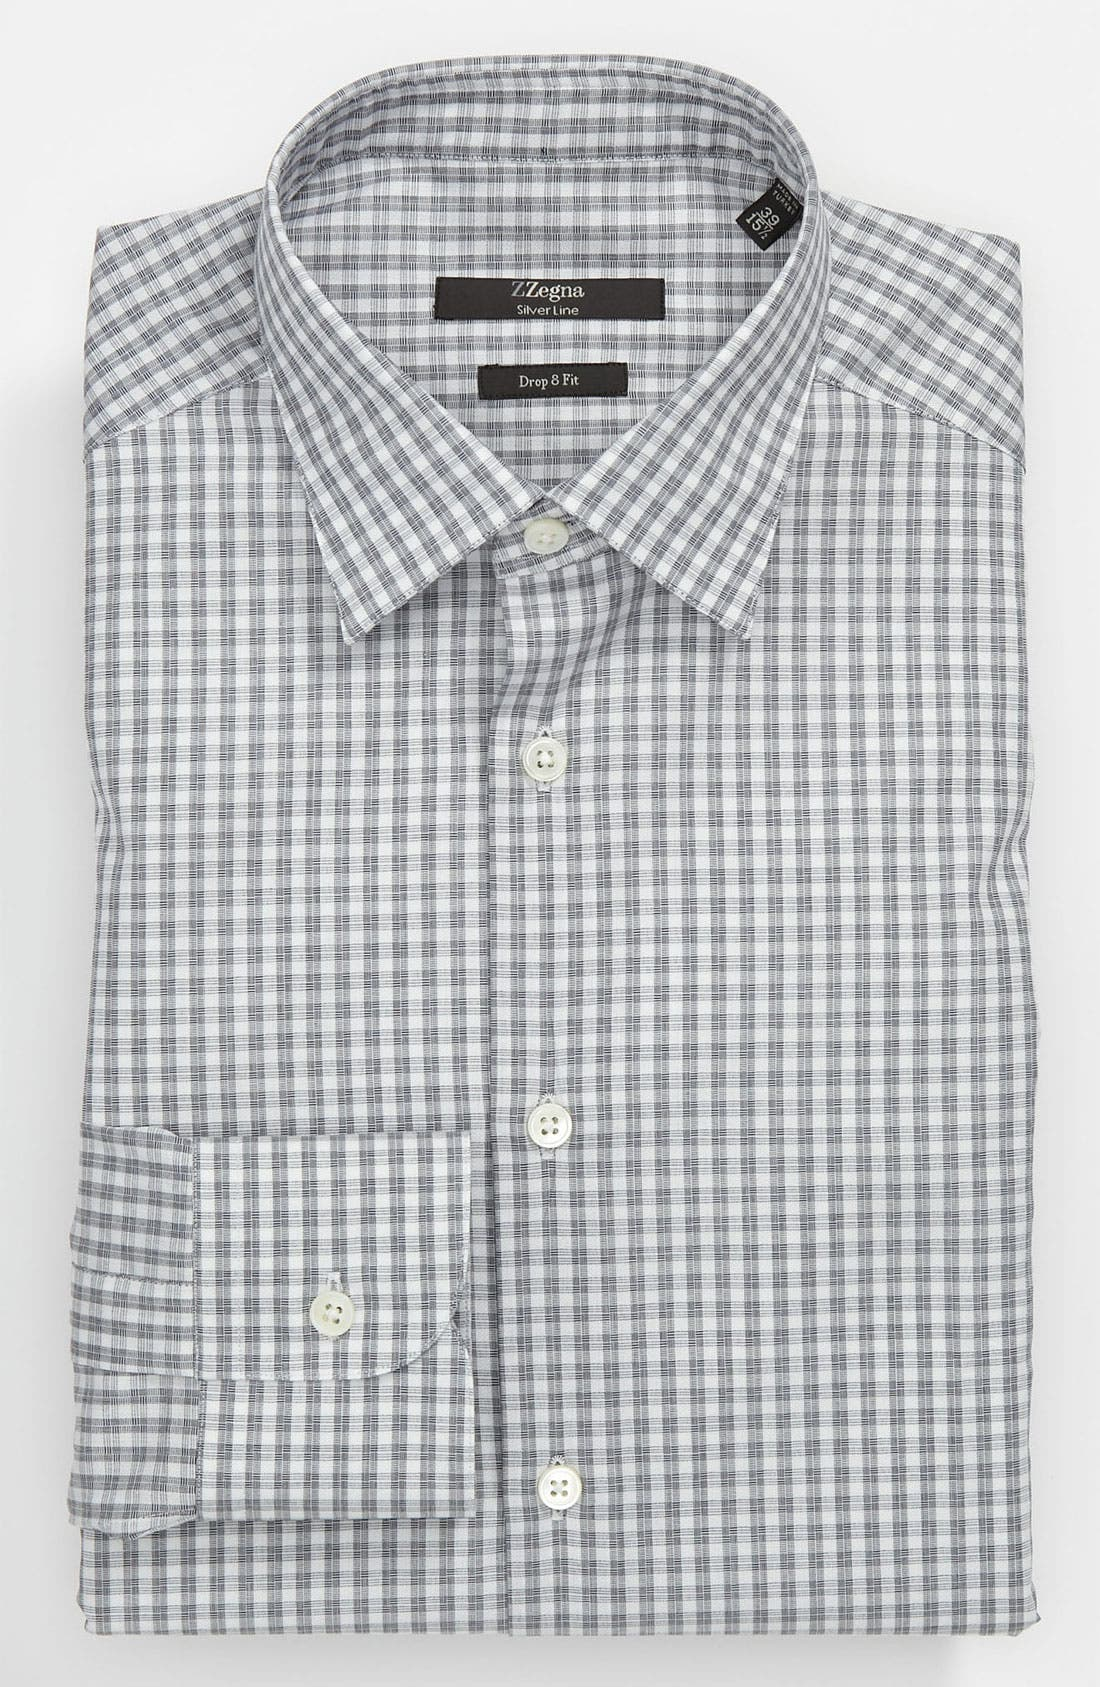 Alternate Image 1 Selected - Z Zegna Drop 8 Fit Dress Shirt